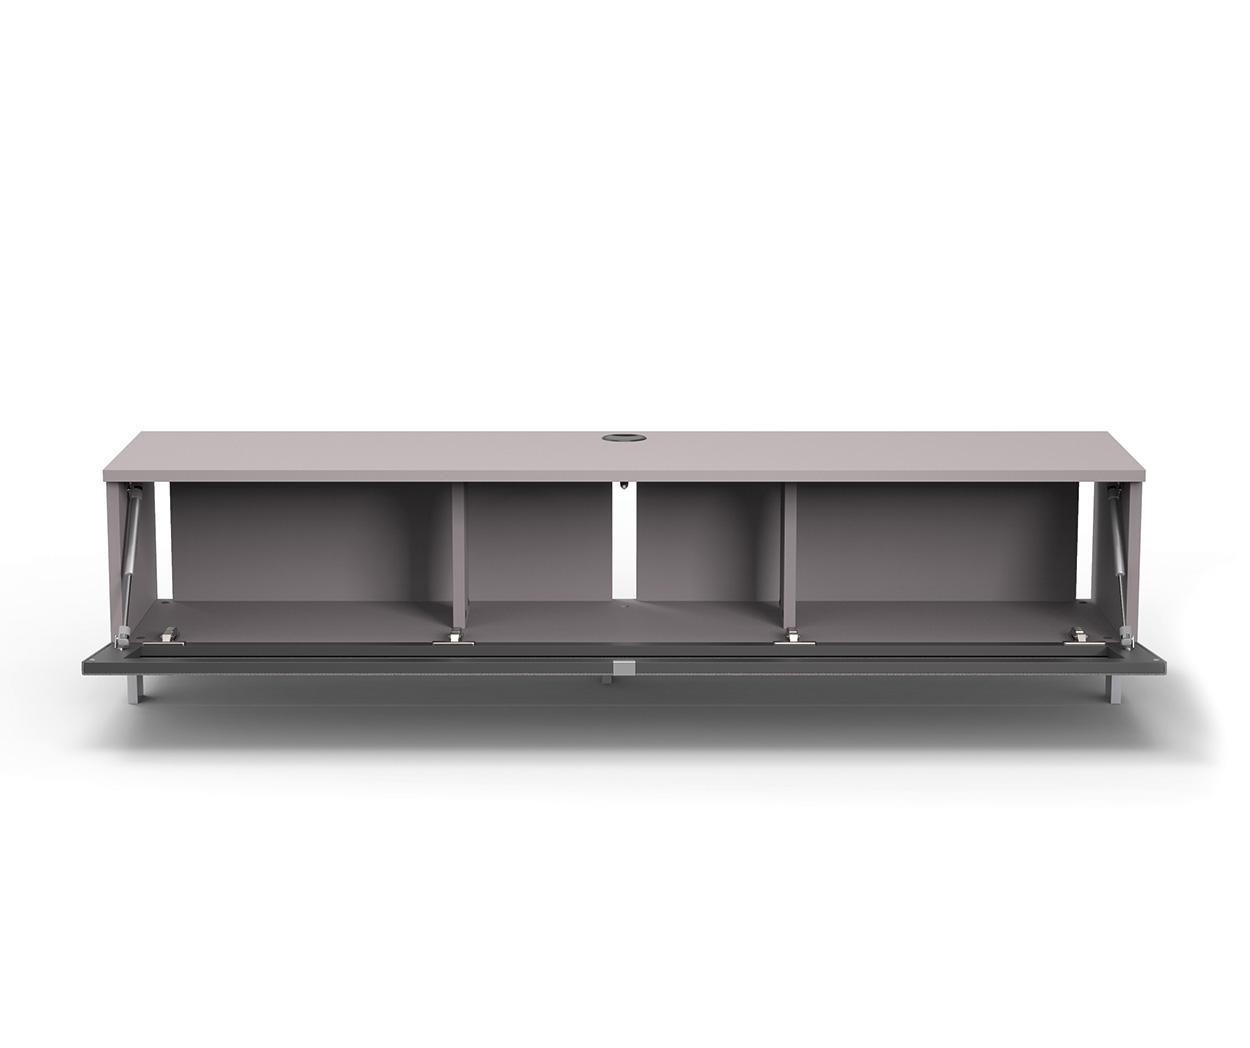 just-racks soundbar tv-meubel JRB1604-GR